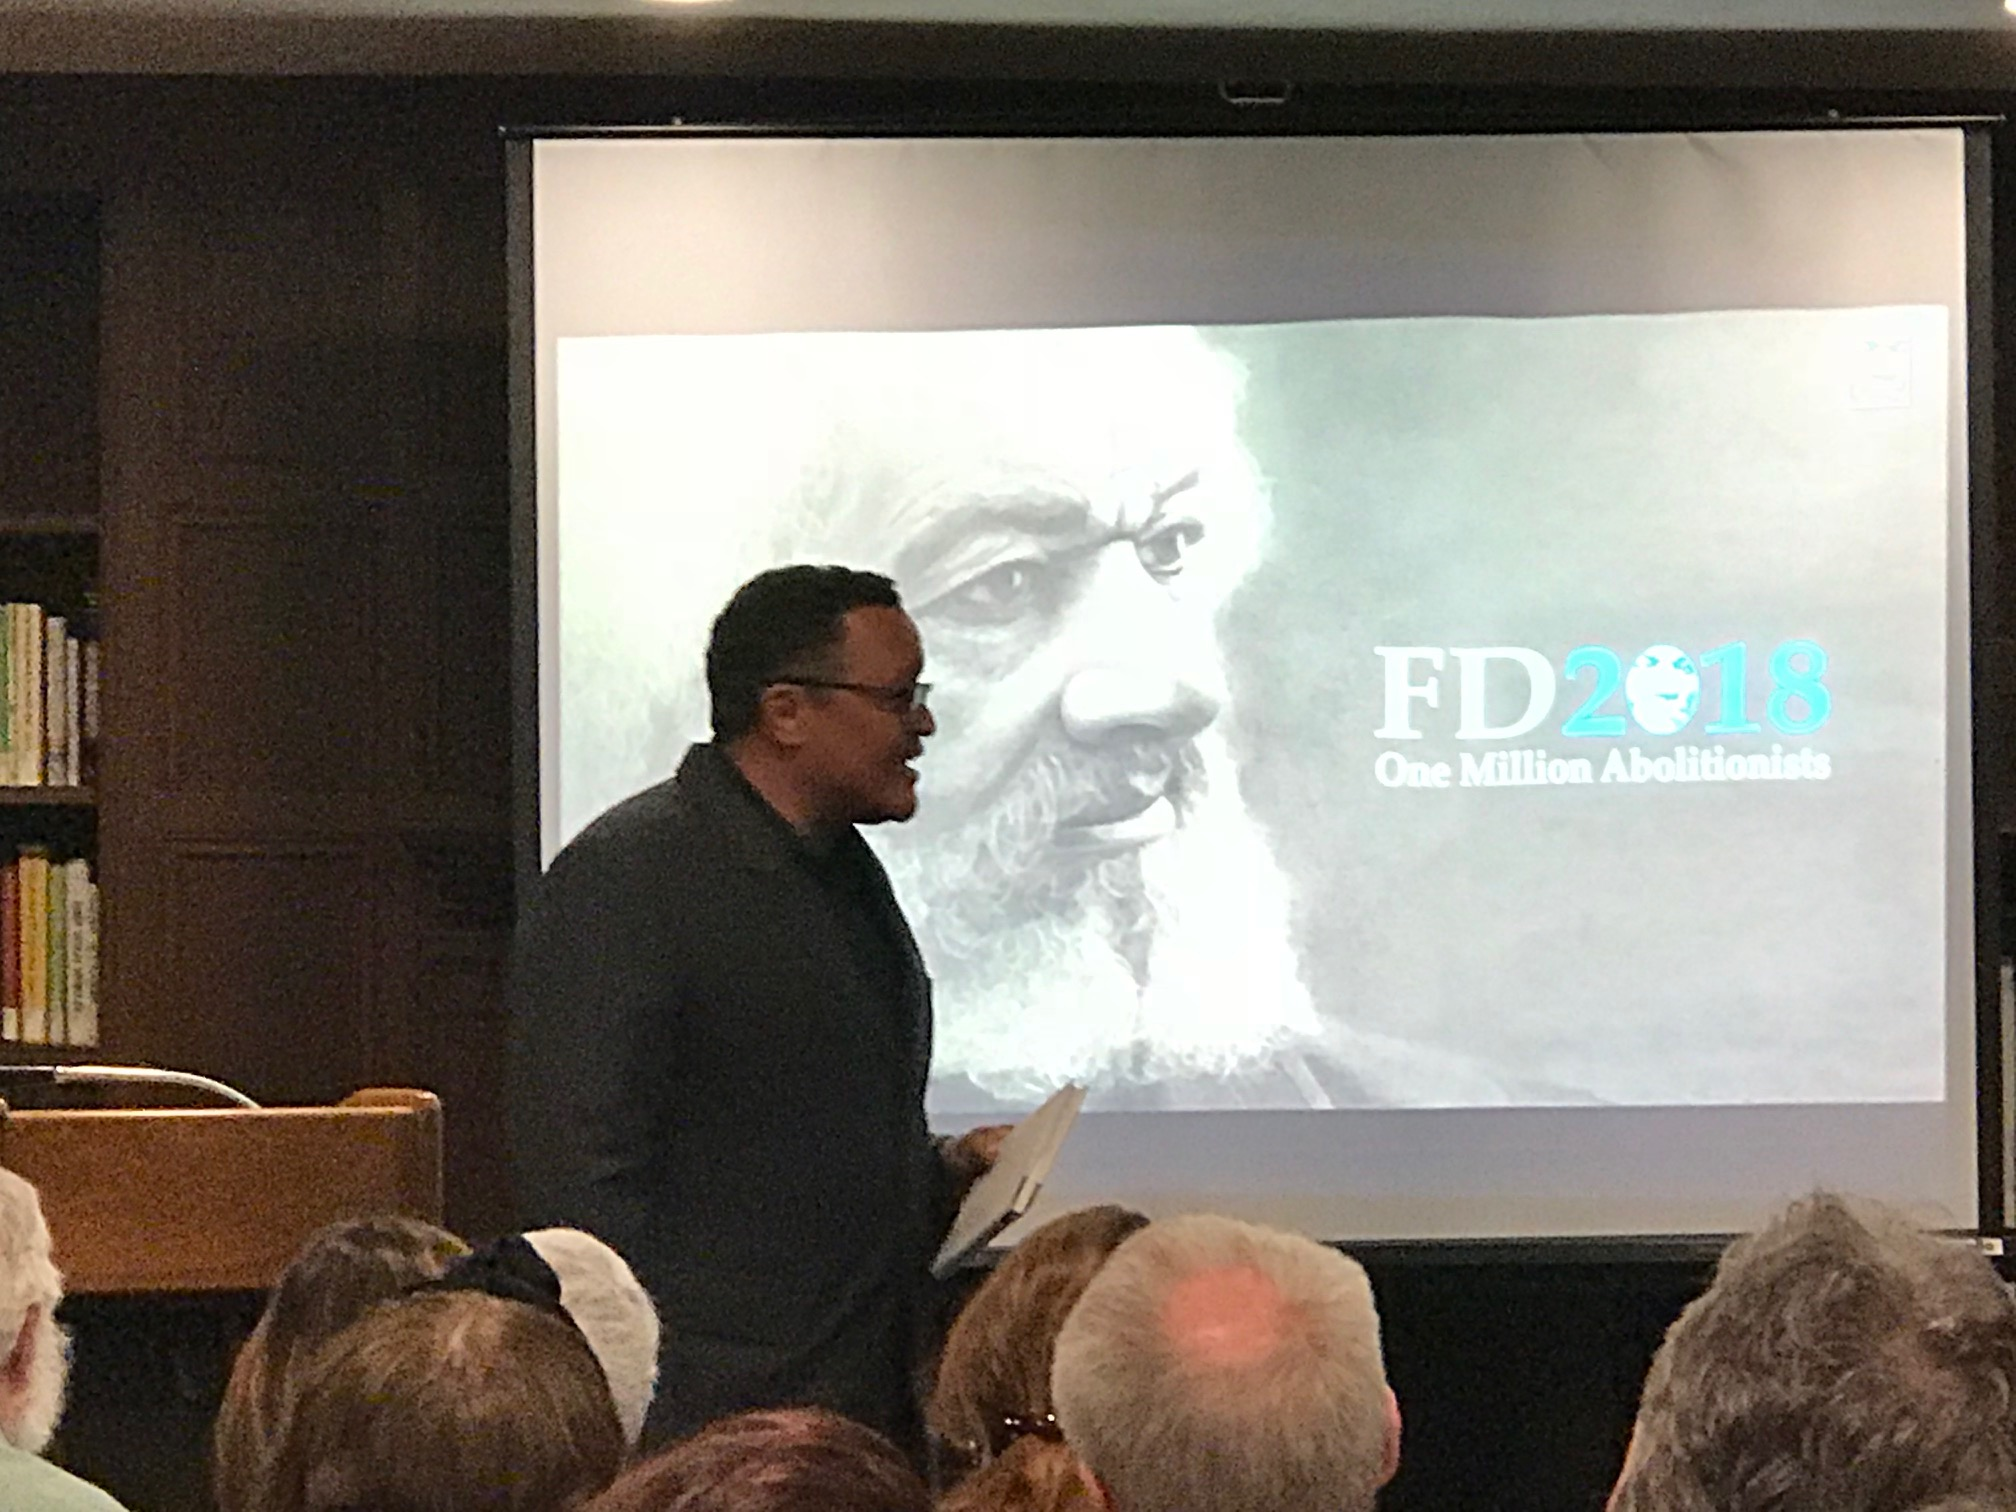 Ken Morris, Jr., great-great-great grandson of Frederick Douglass, speaking at The Walden Woods Project.